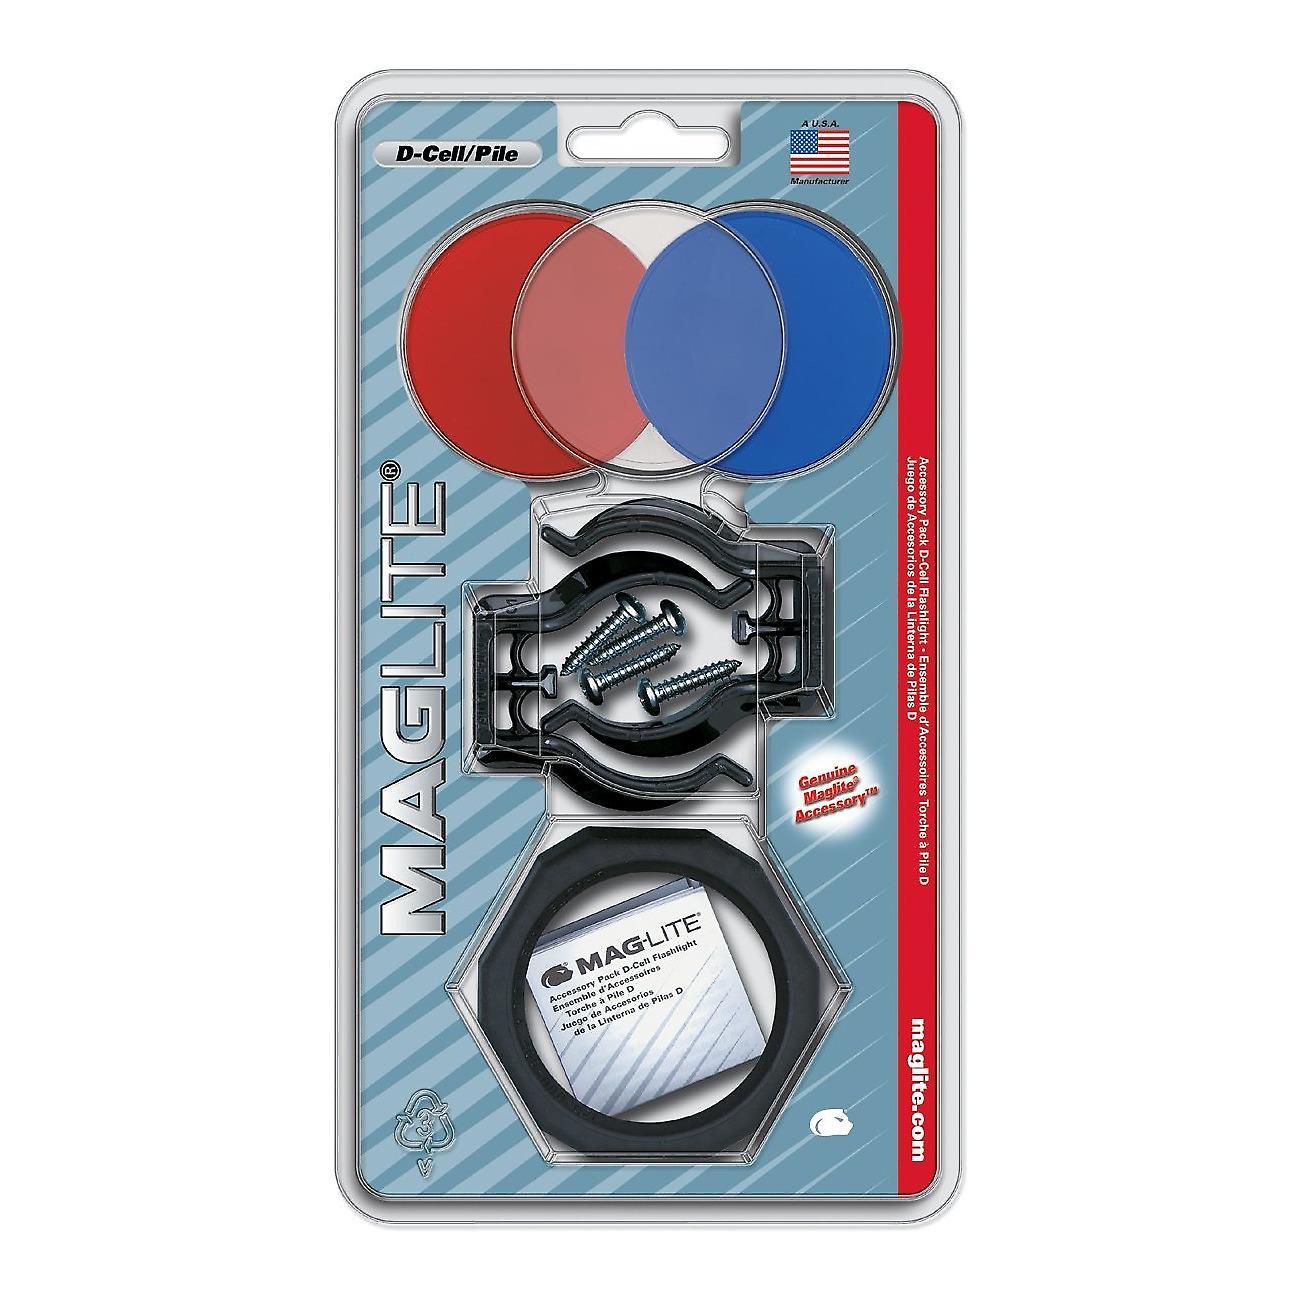 Maglite D cell accessory kit - lens - holder - bracket clamps